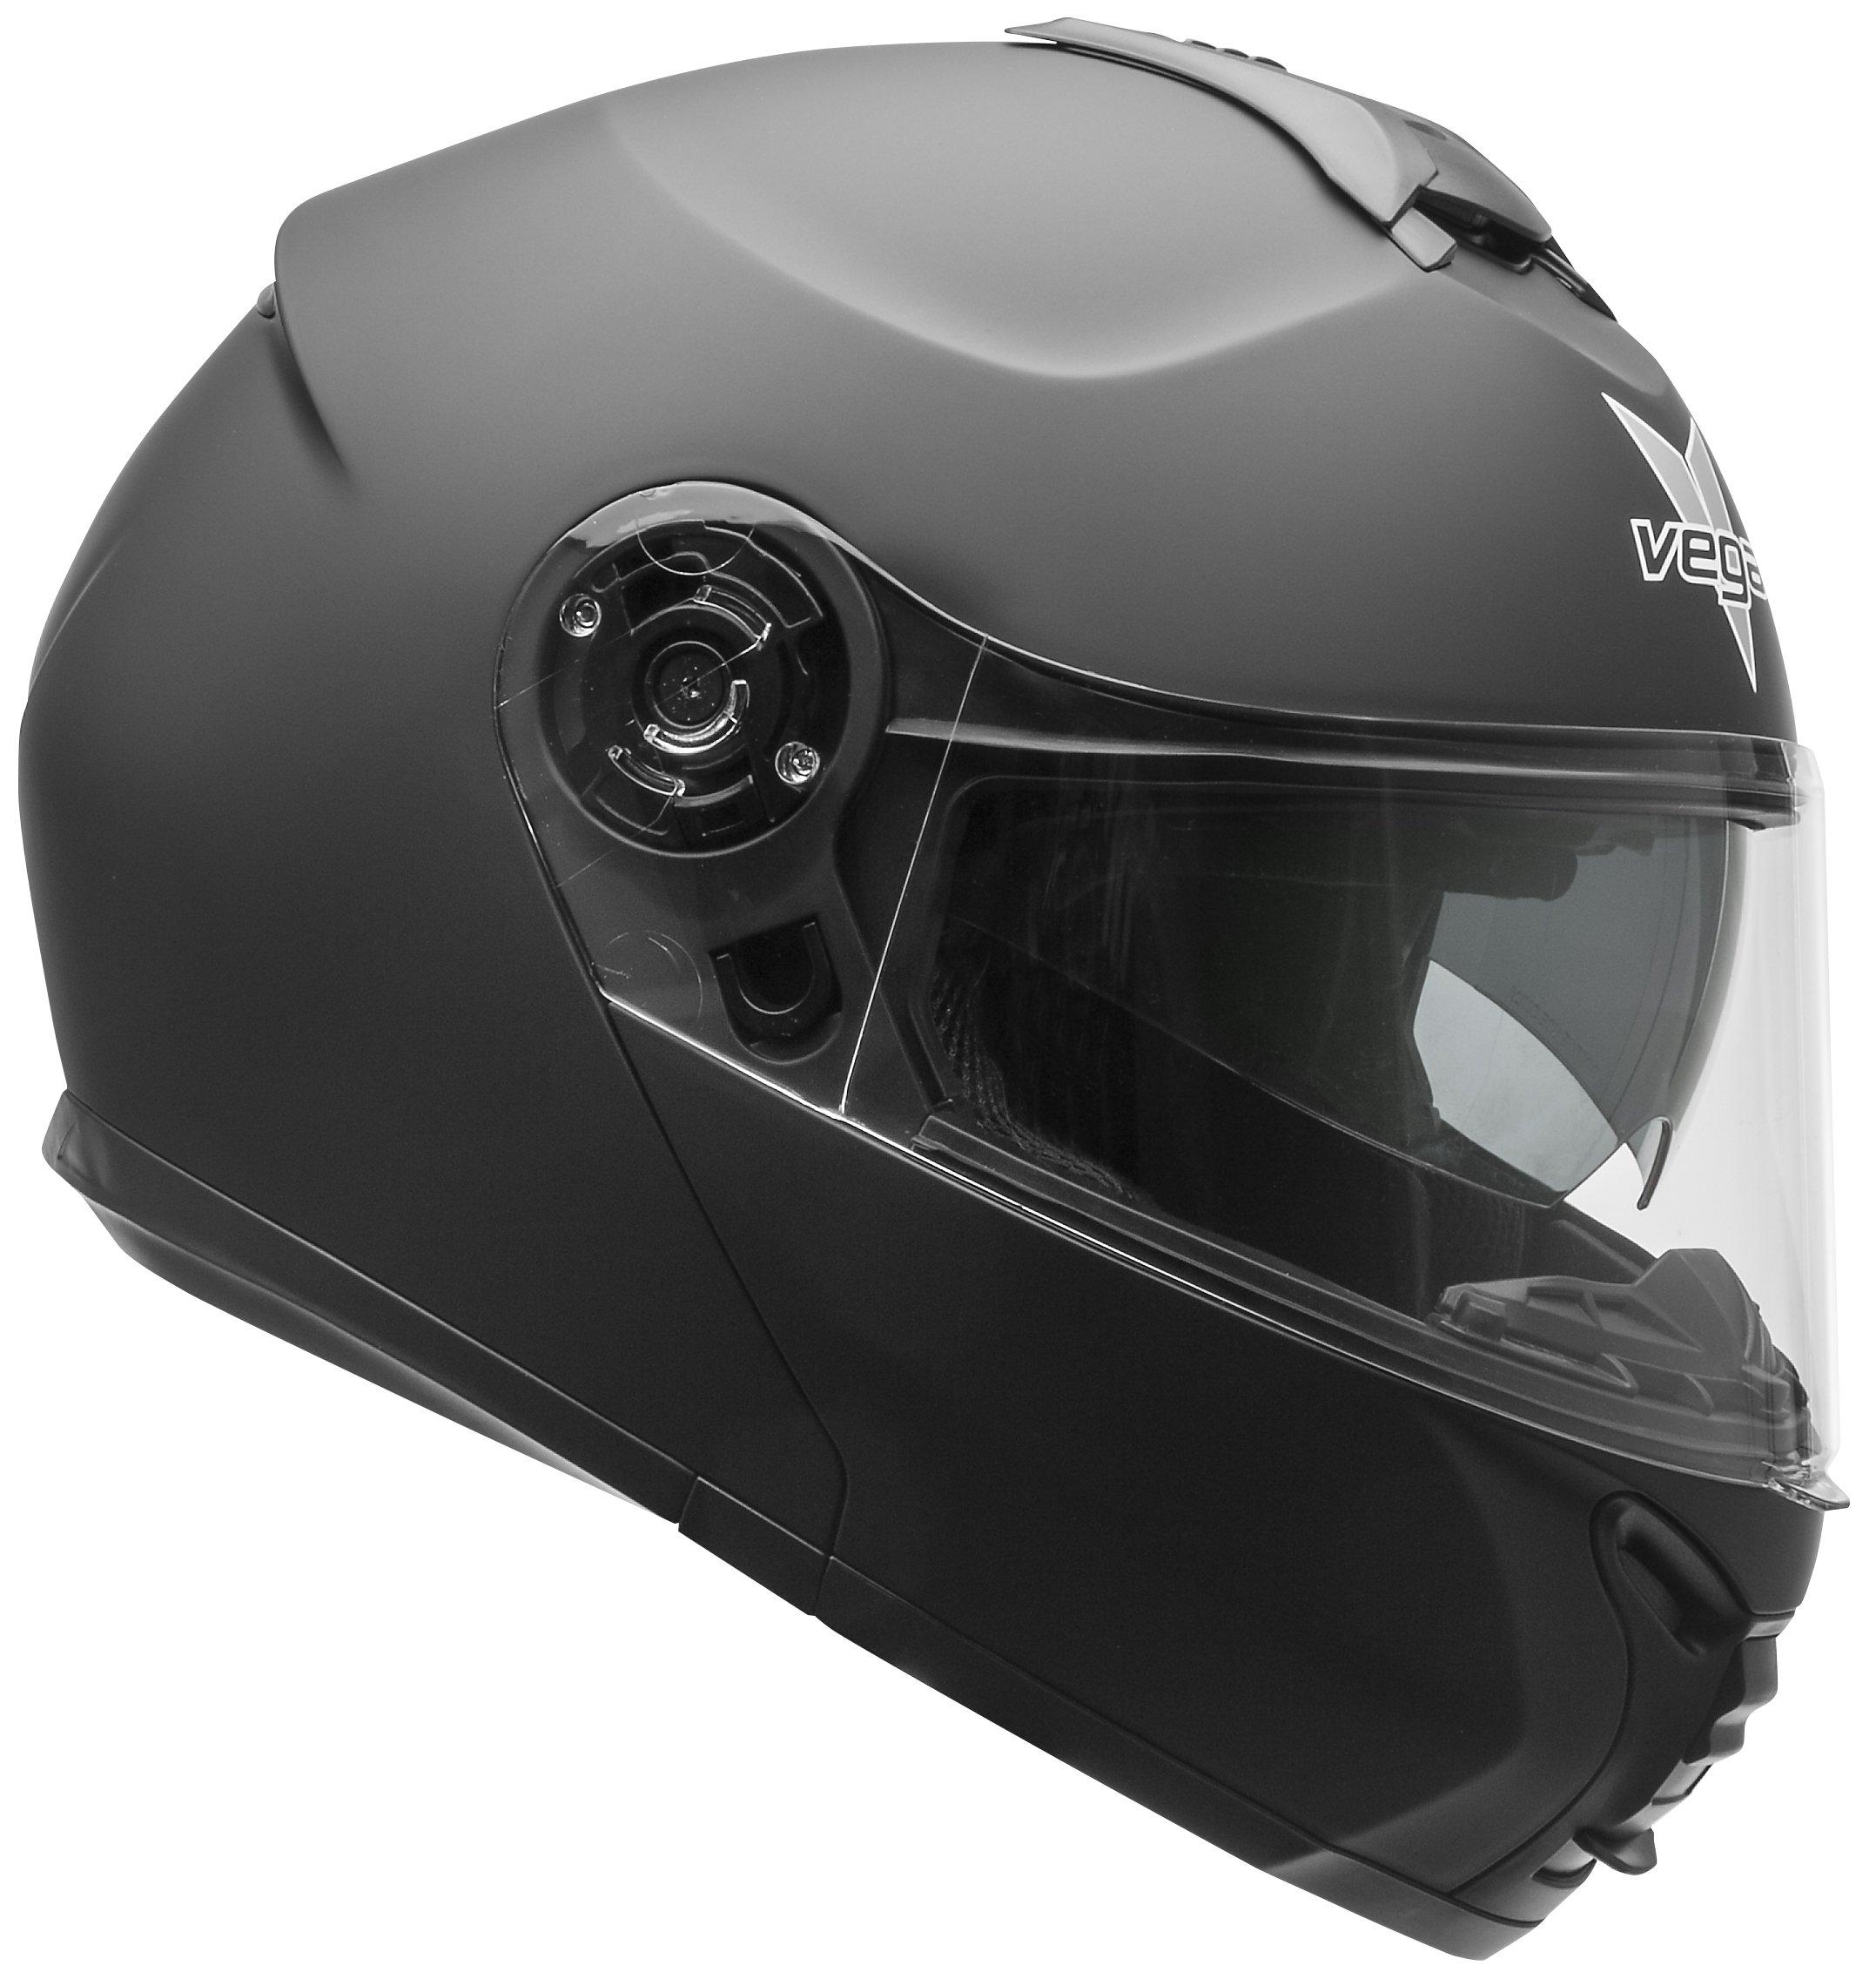 Vega Helmets VR1 Modular Motorcycle Helmet with Sunshield - DOT Certified Half to Full Face Flip Up Motorbike Helmet for Cruisers Scooter Touring Moped, Bluetooth Compat (Matte Black, Medium) by Vega Helmets